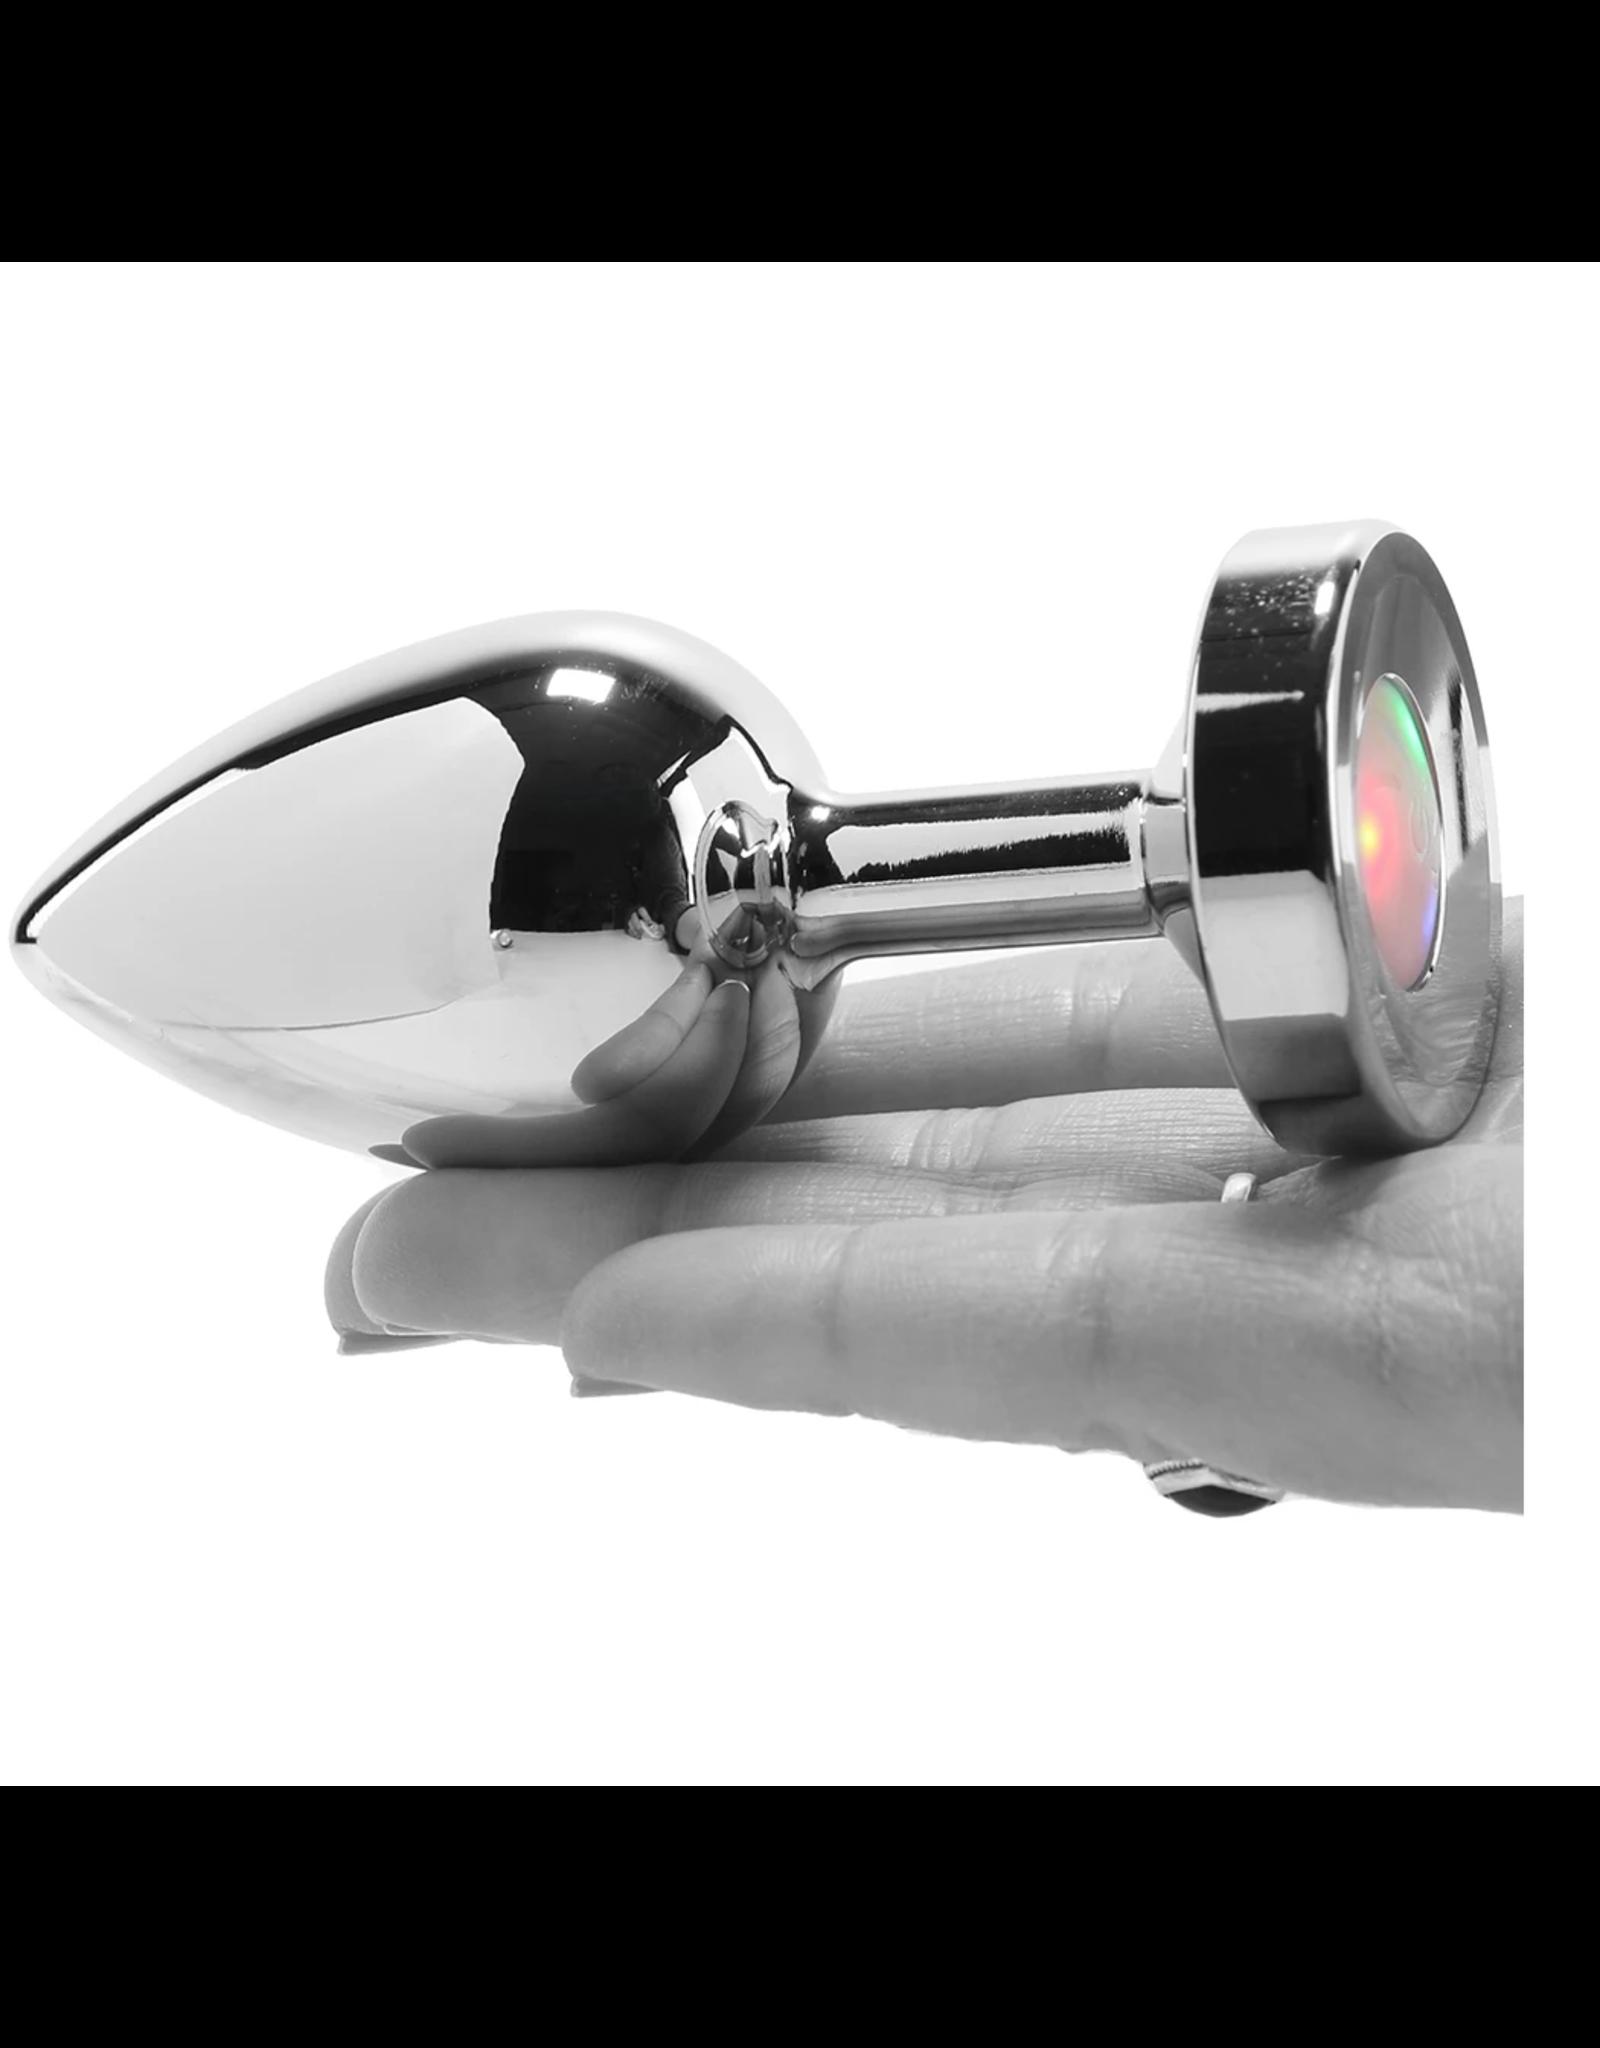 BOOTY SPARKS - LIGHT UP ANAL PLUG - LARGE